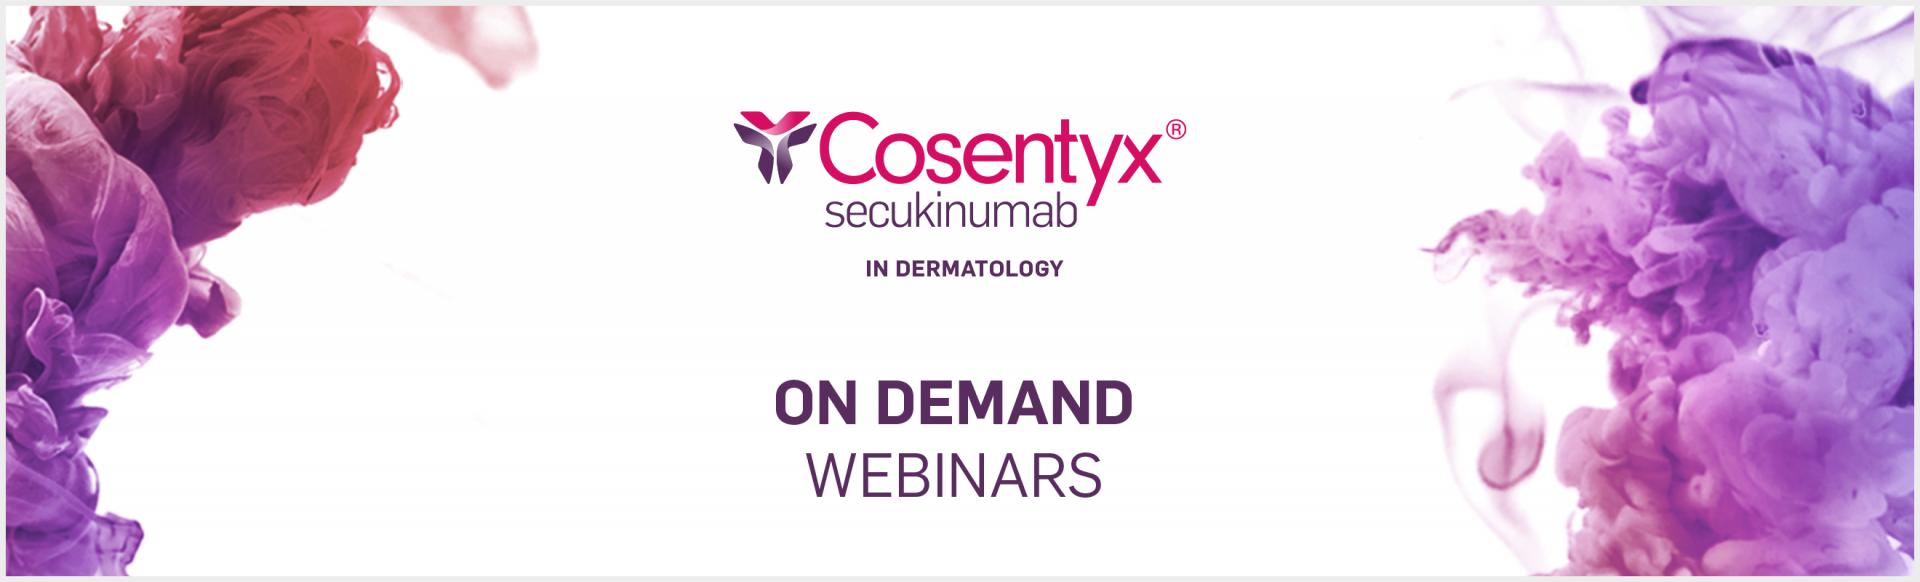 Top Banner: Cosentyx Webinar